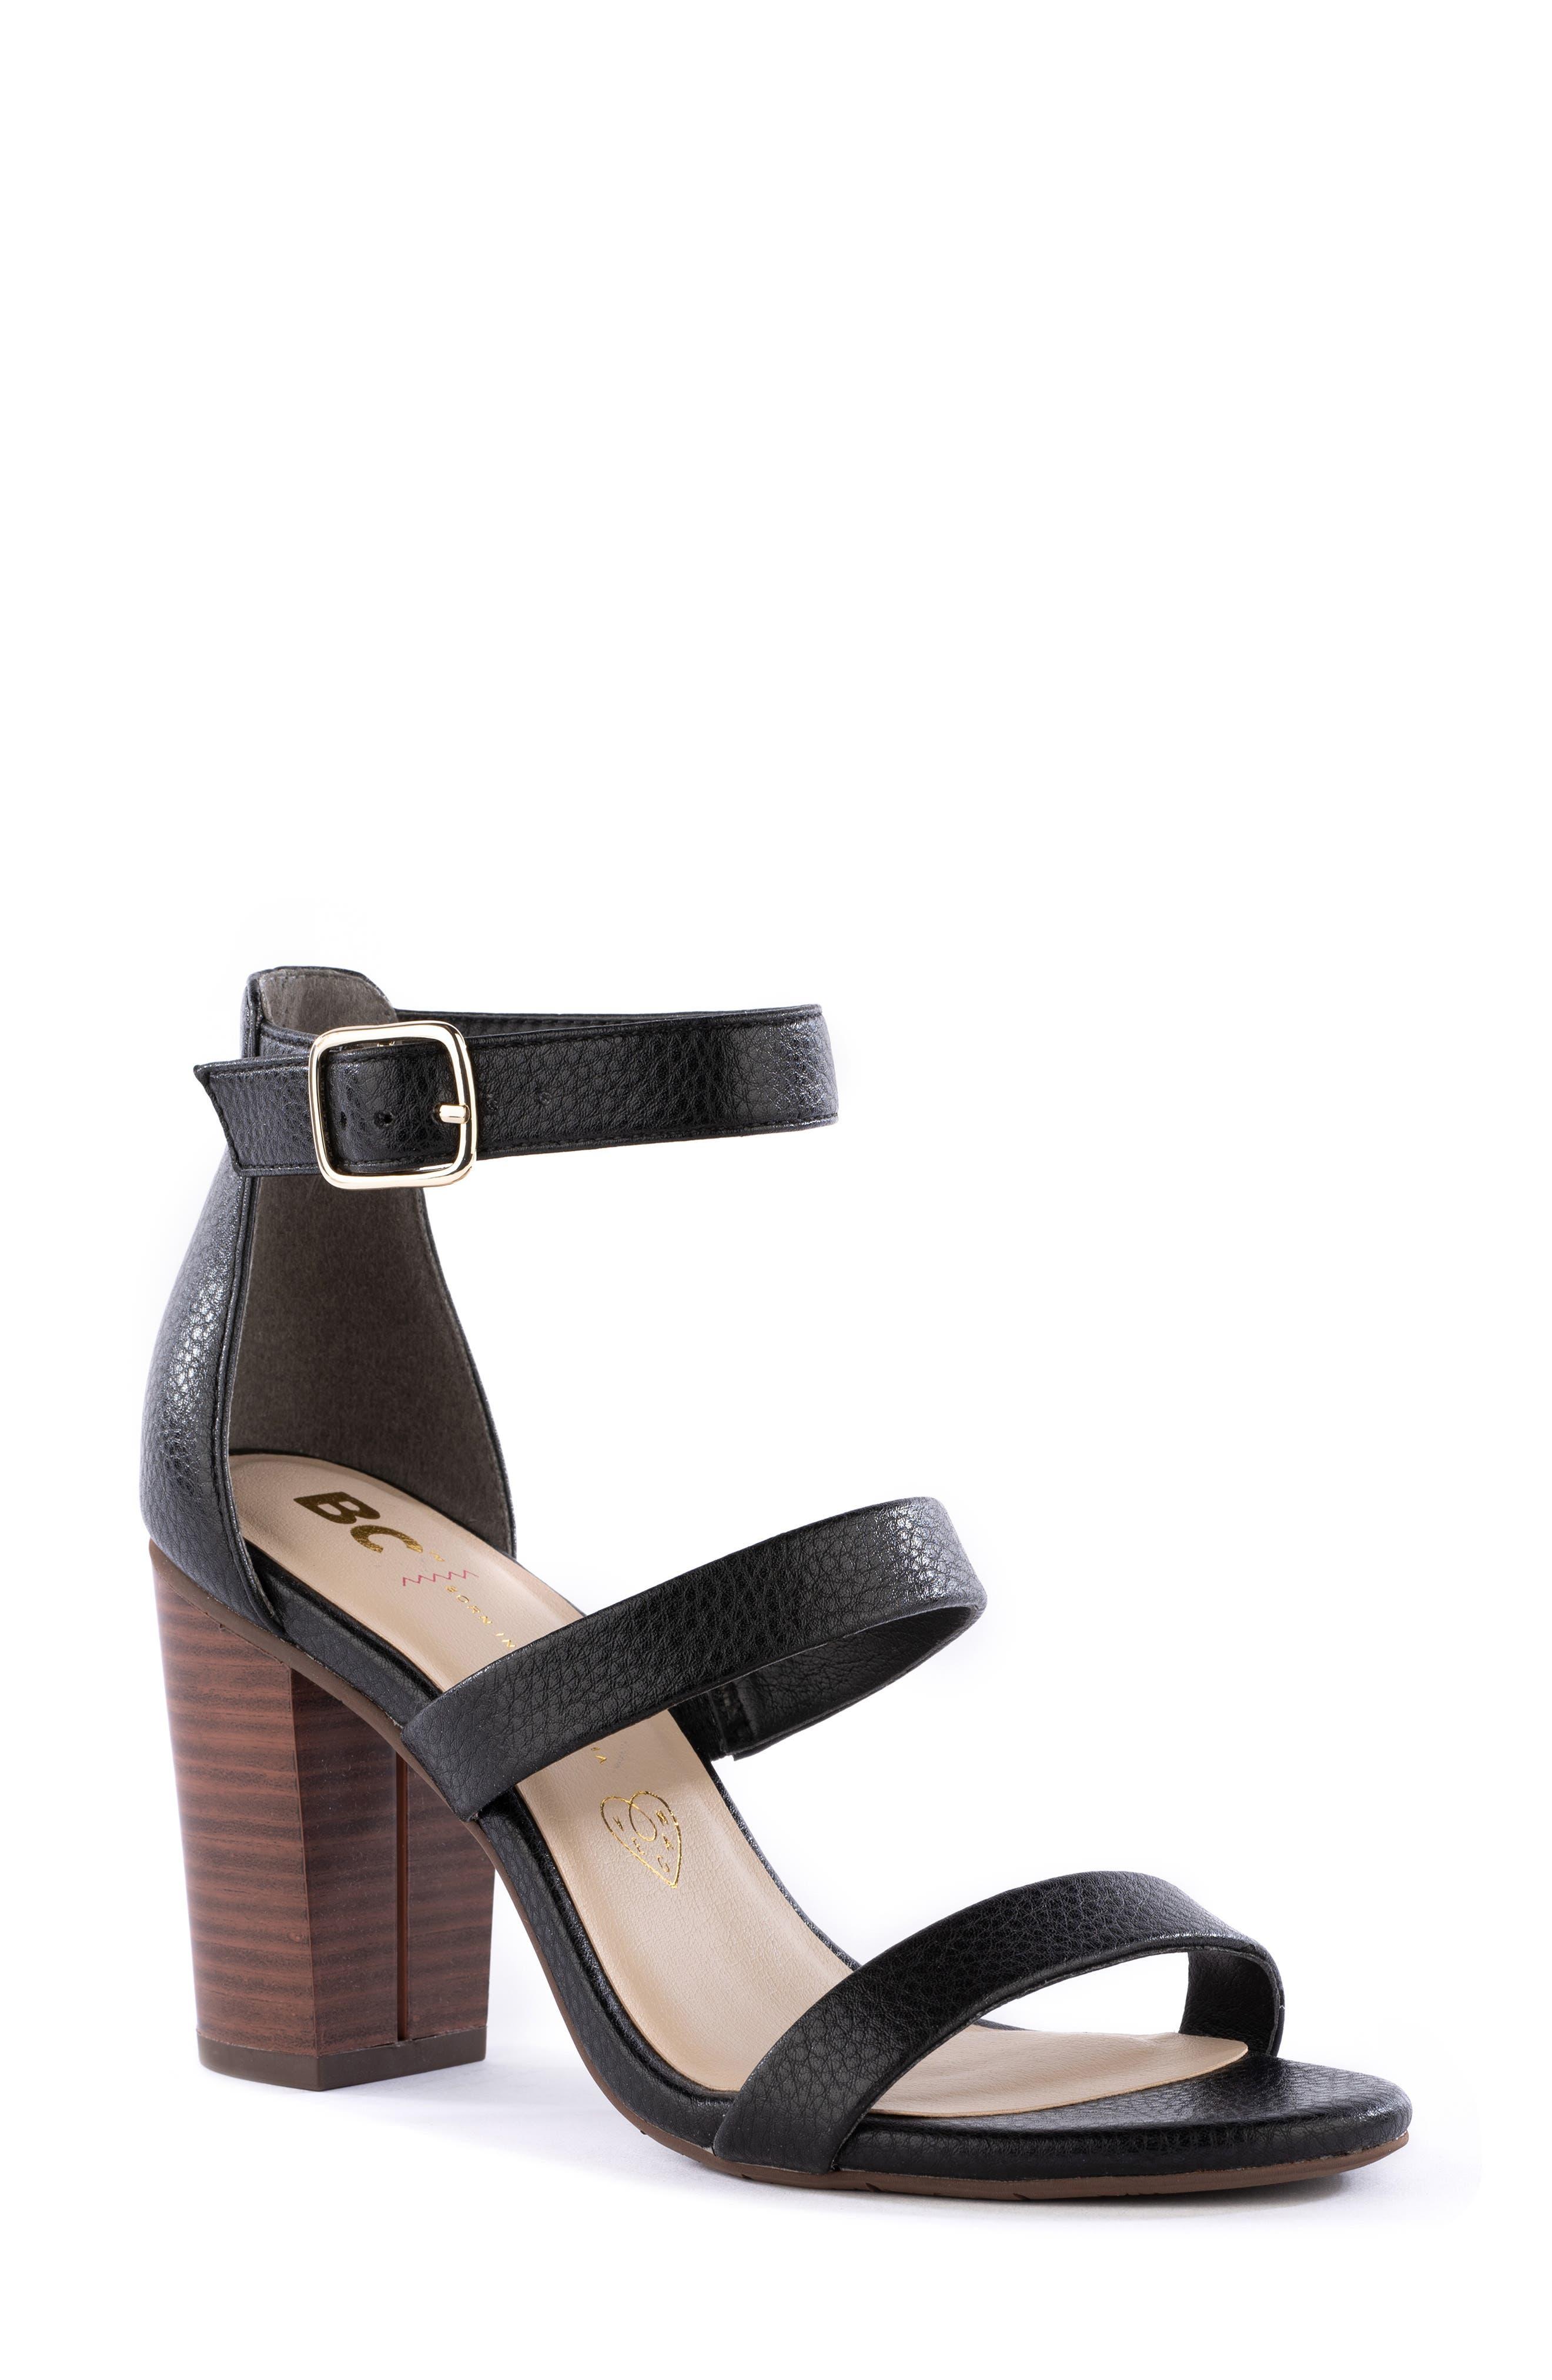 Justified Ankle Strap Sandal